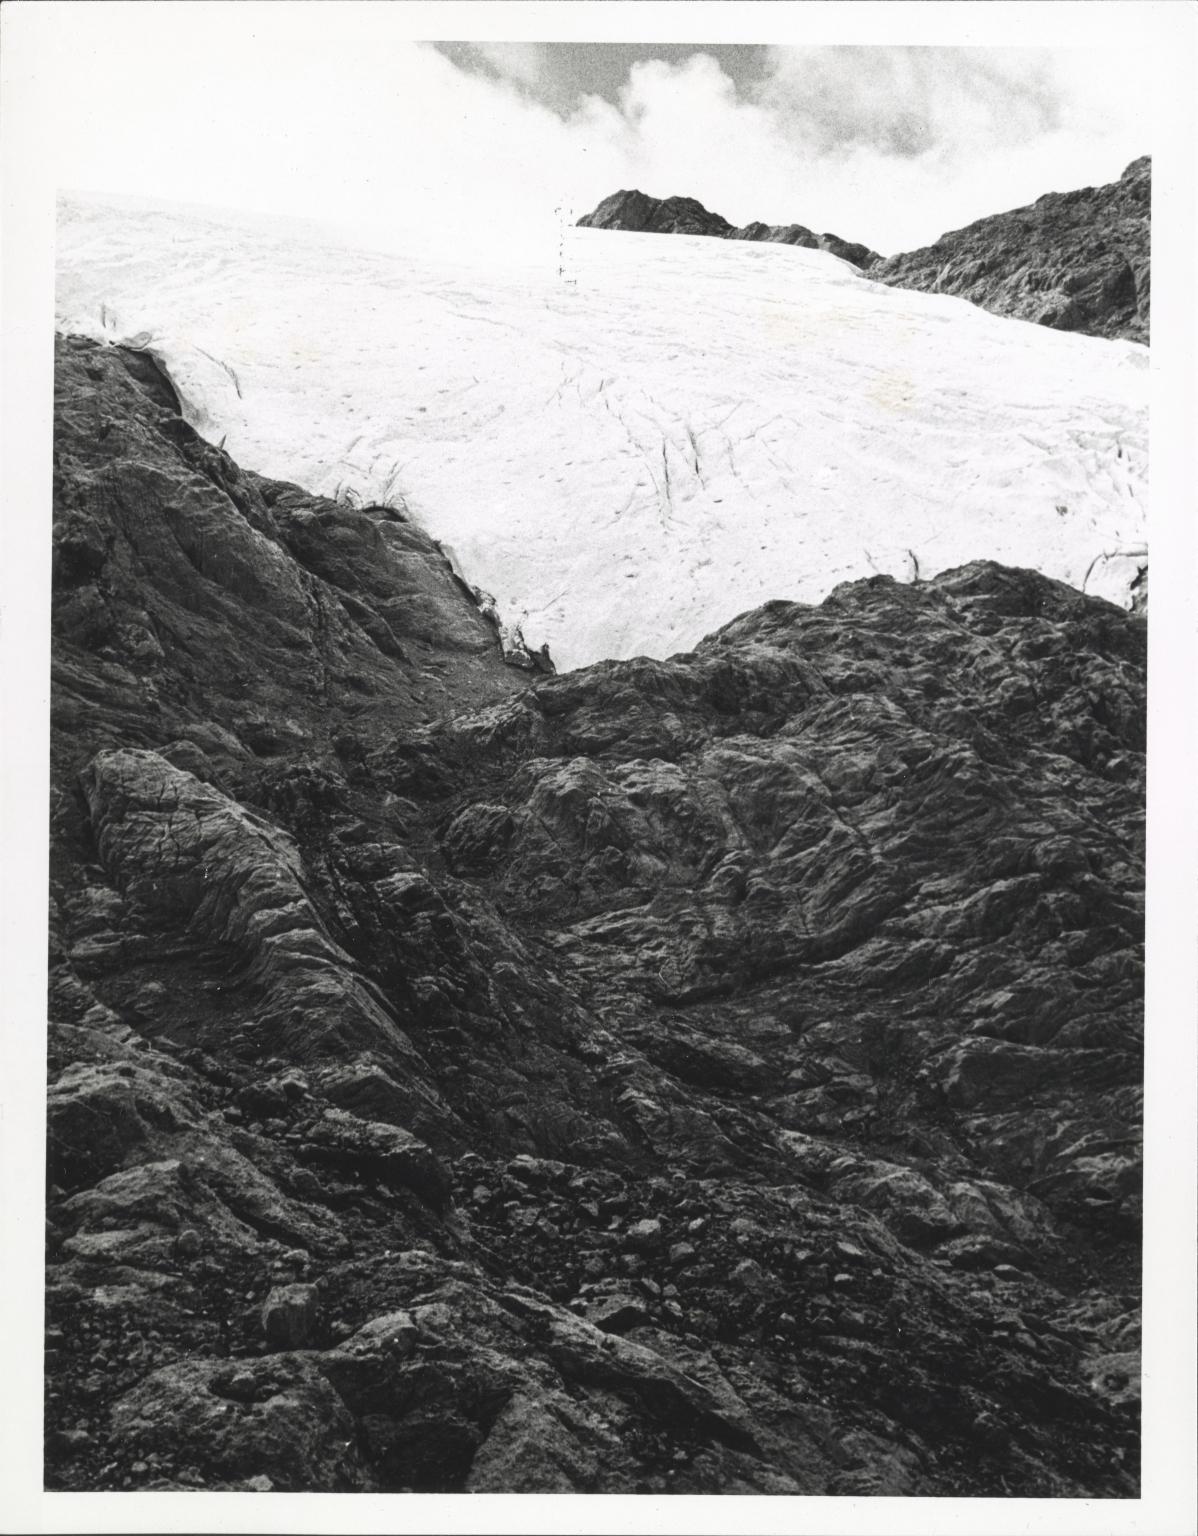 Glacier in the Irian Jaya, Indonesia